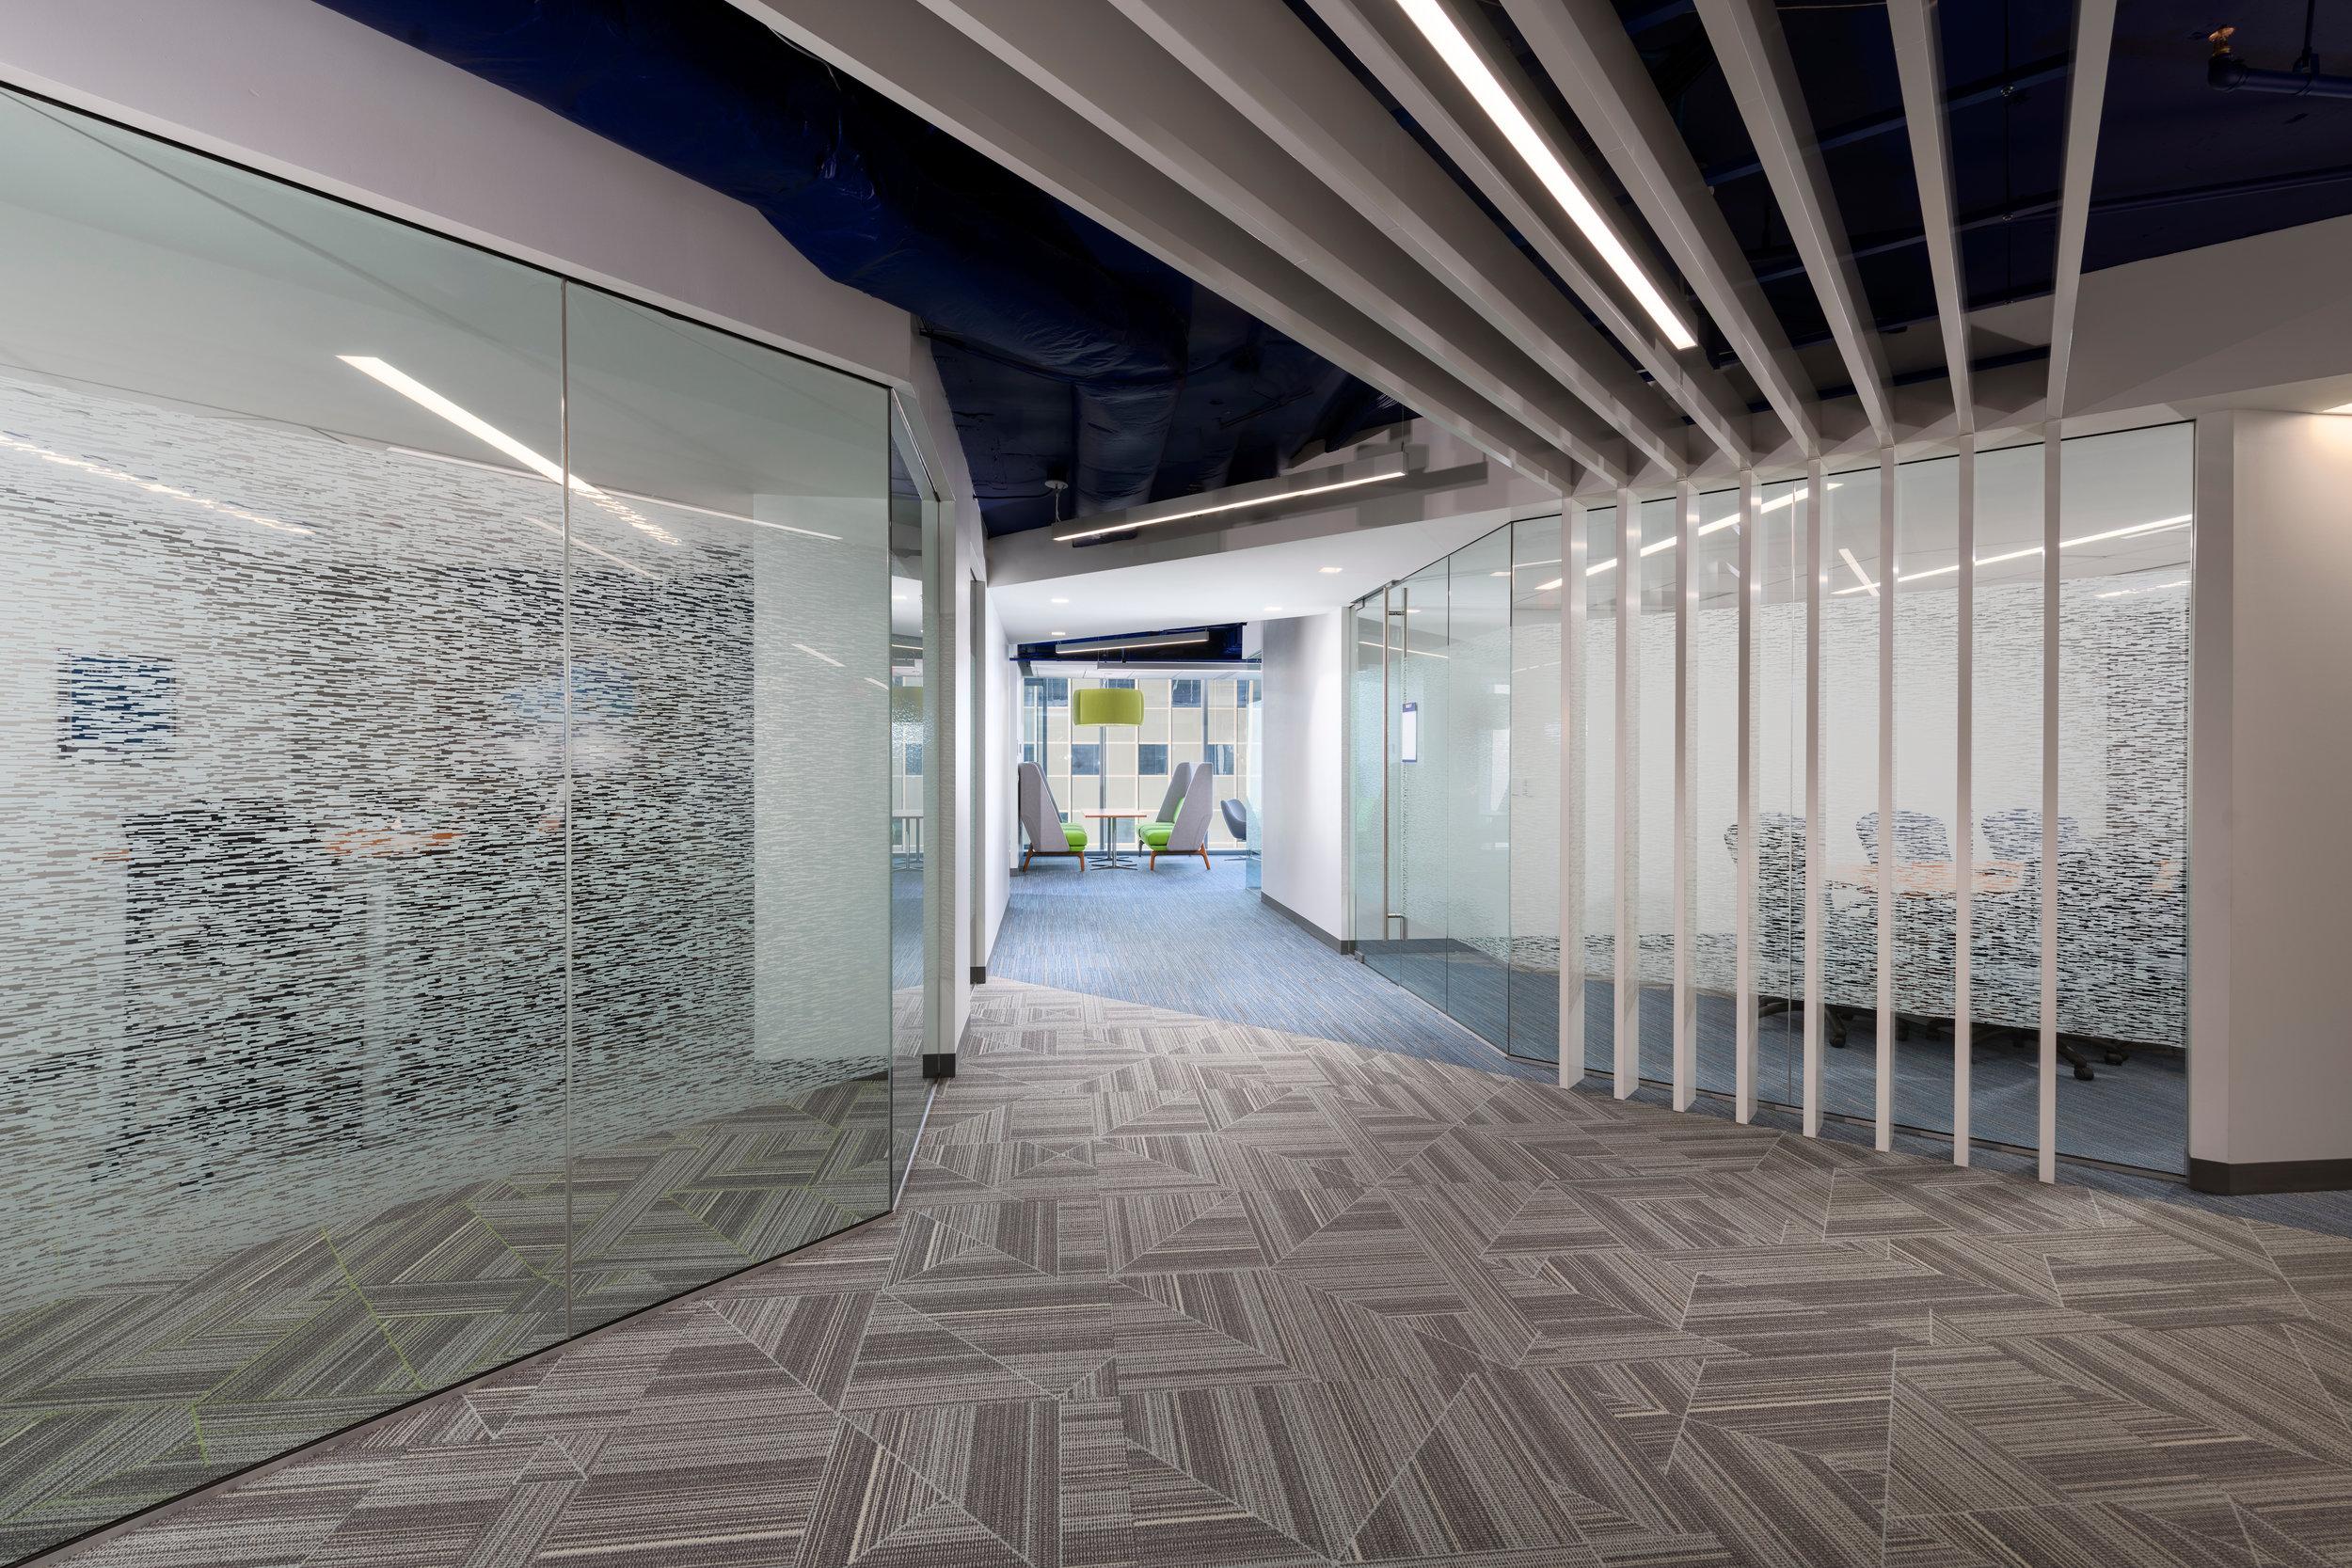 American Institutes for Research - Corridor